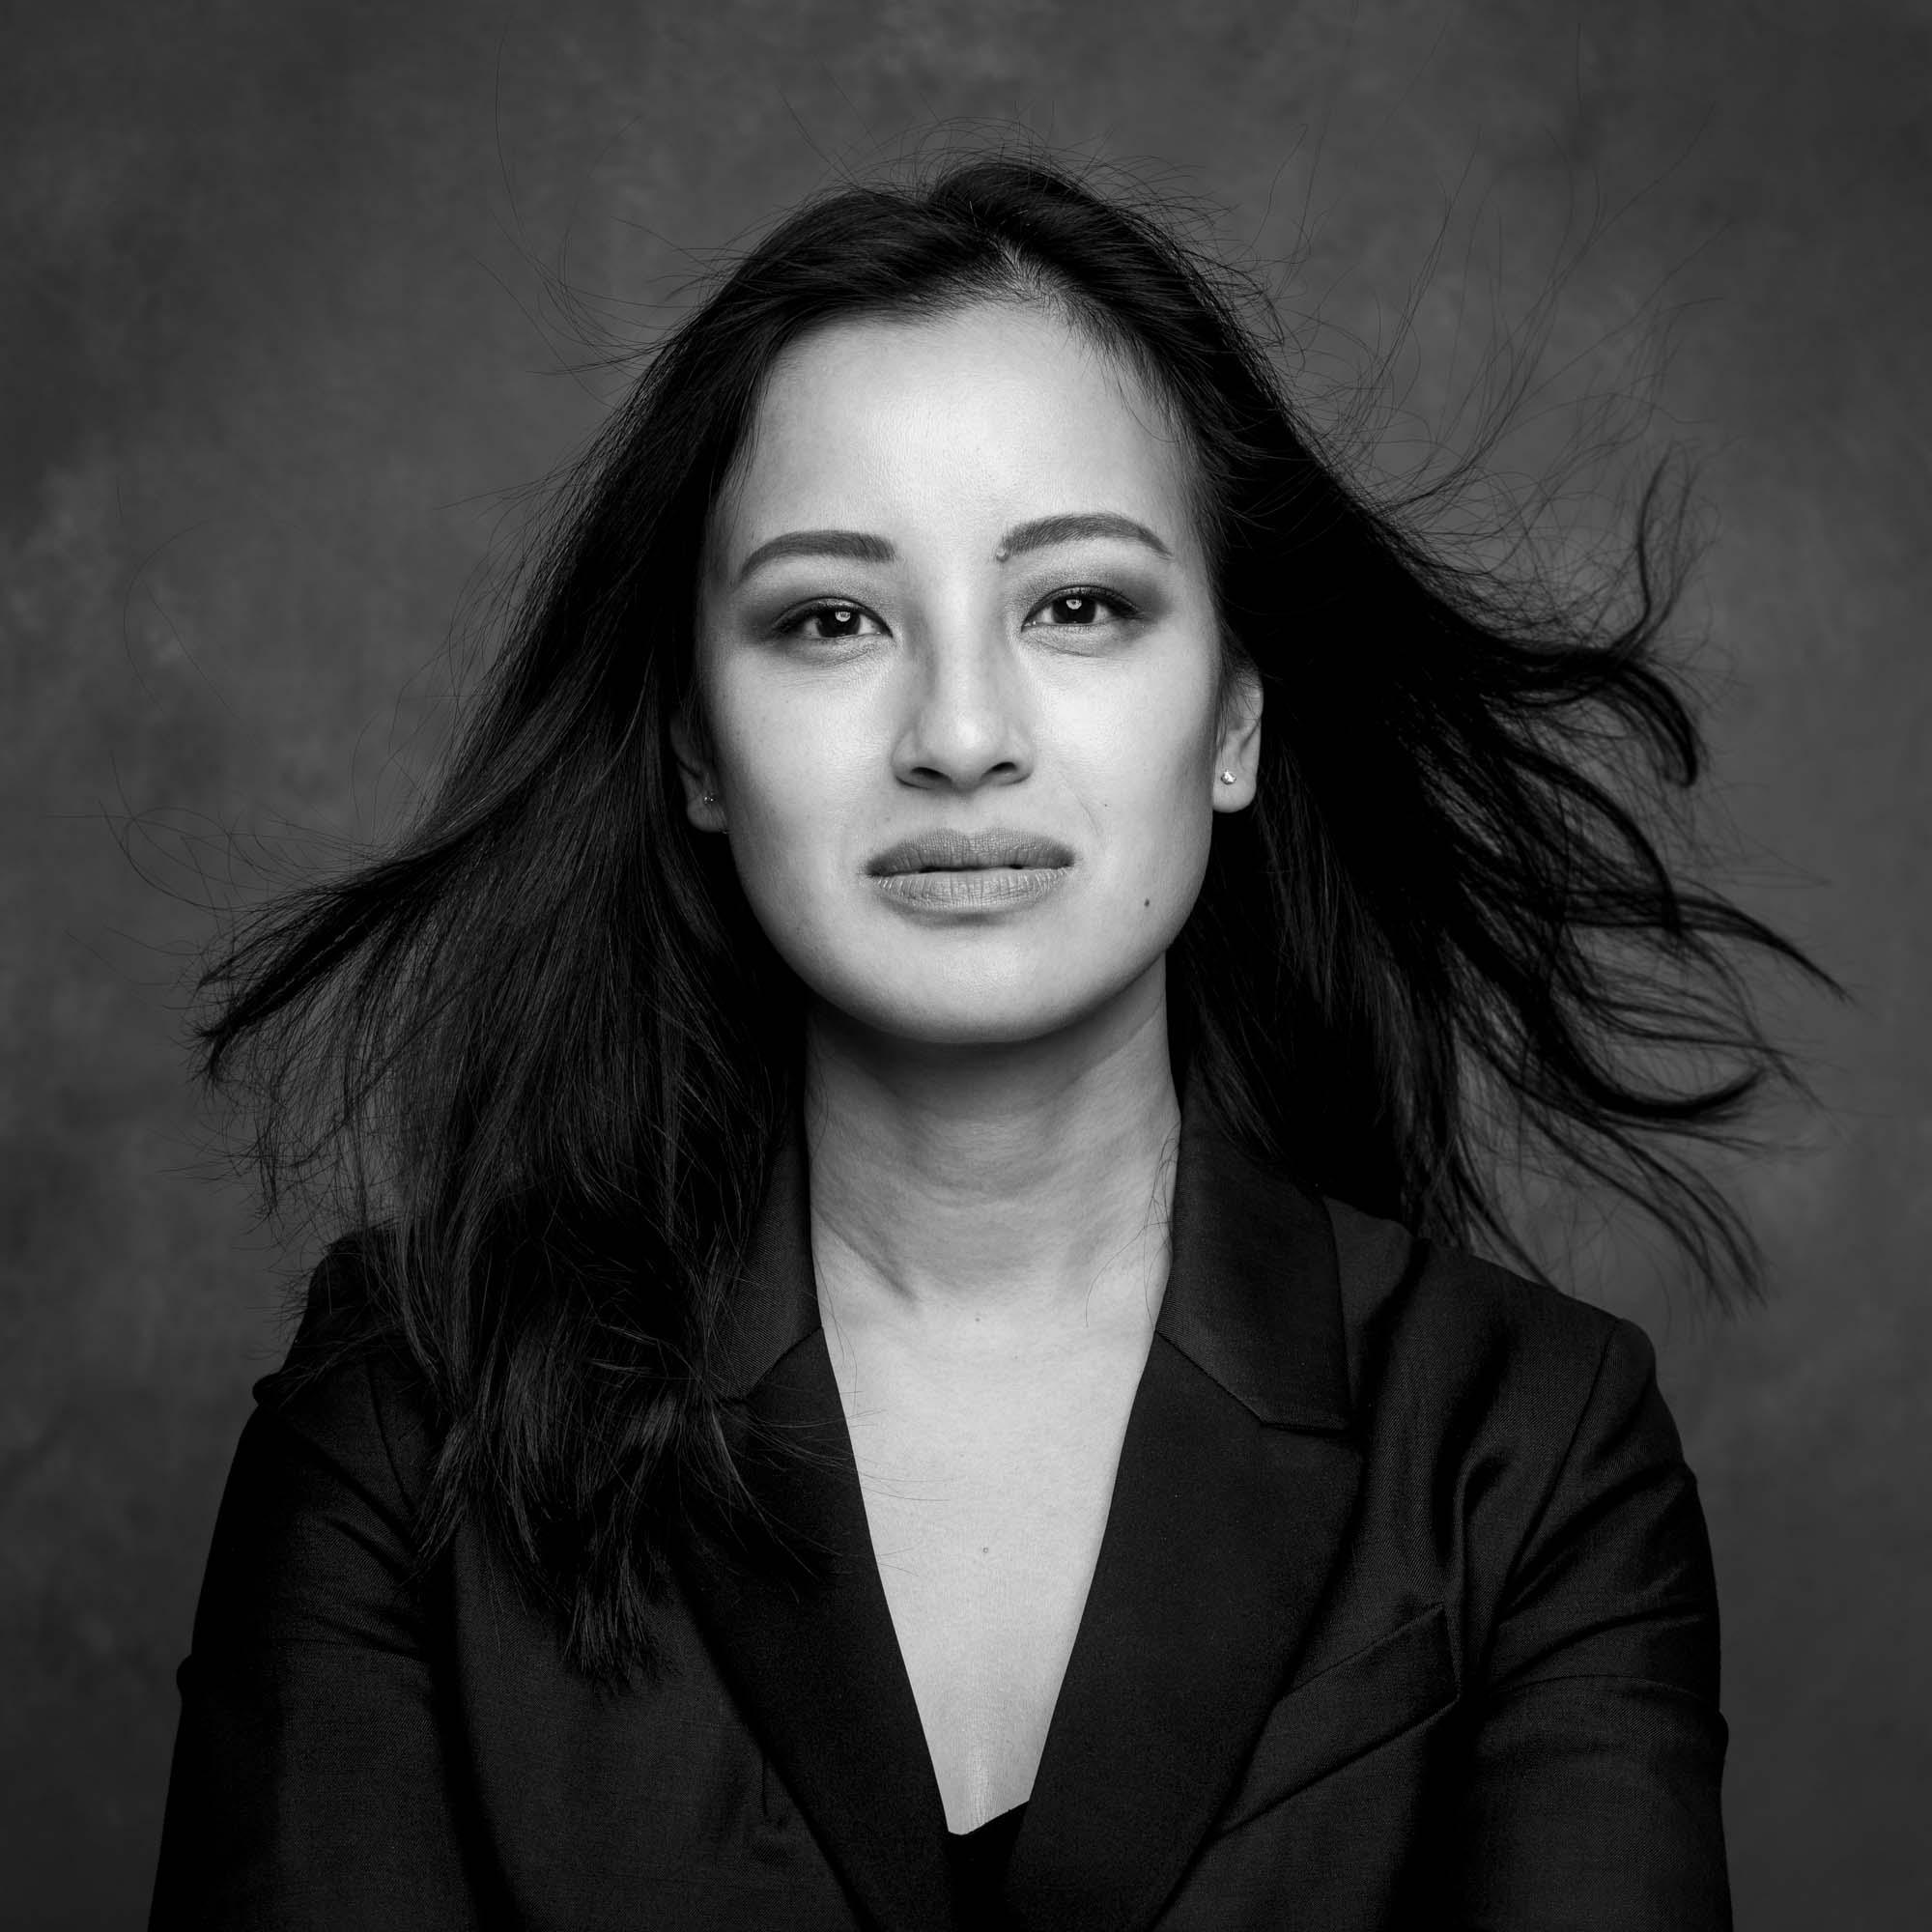 Portrait photography studio singapore services asia photographer photoshoot model black white magazine portrait